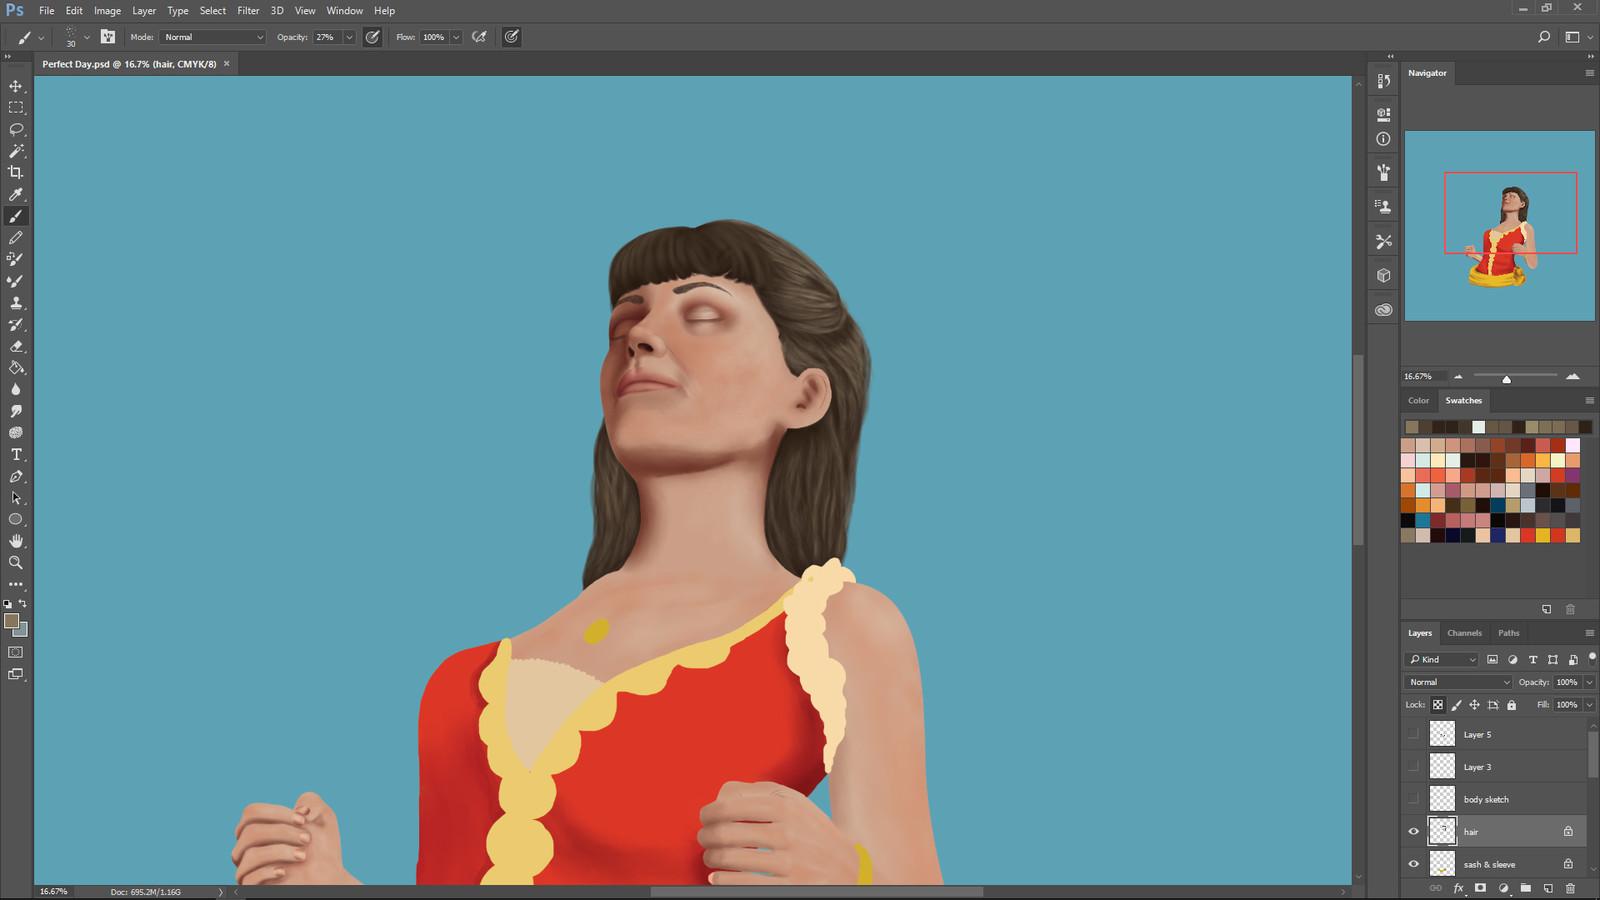 Second in progress screenshot.